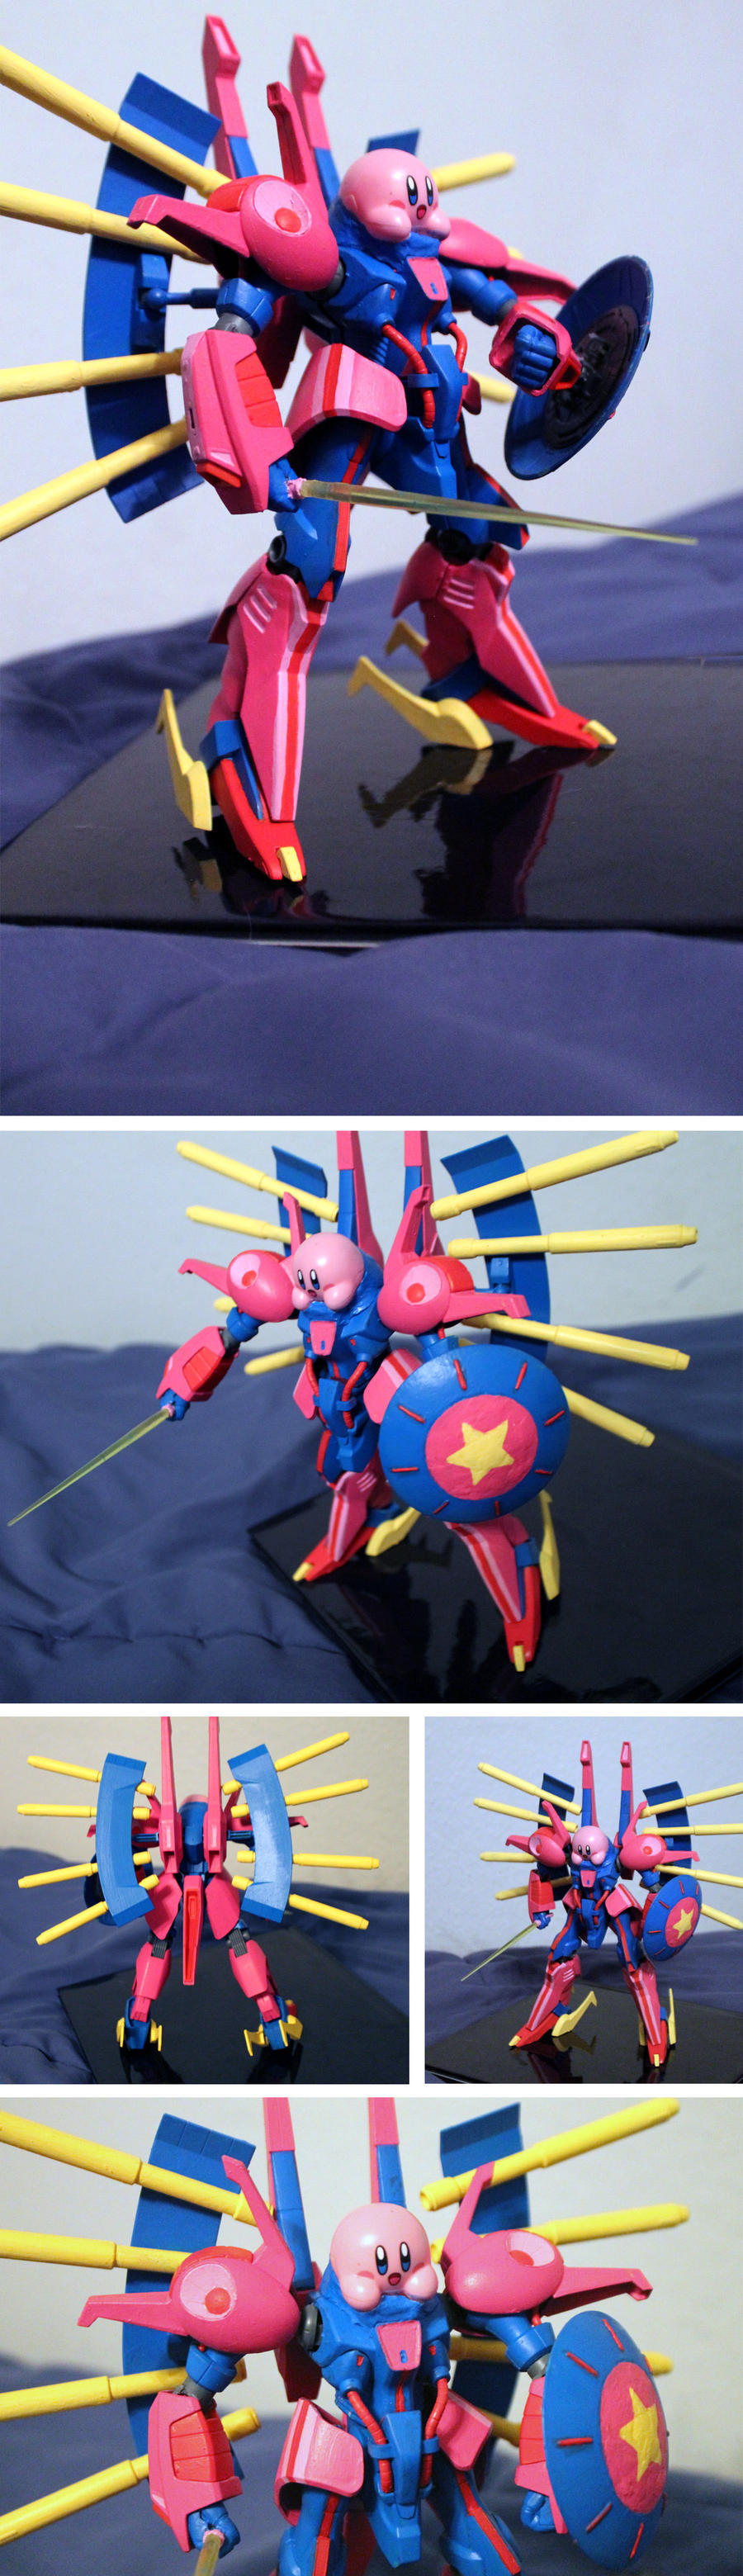 Custom Gunpla: Palace Kirby by OddPenguin